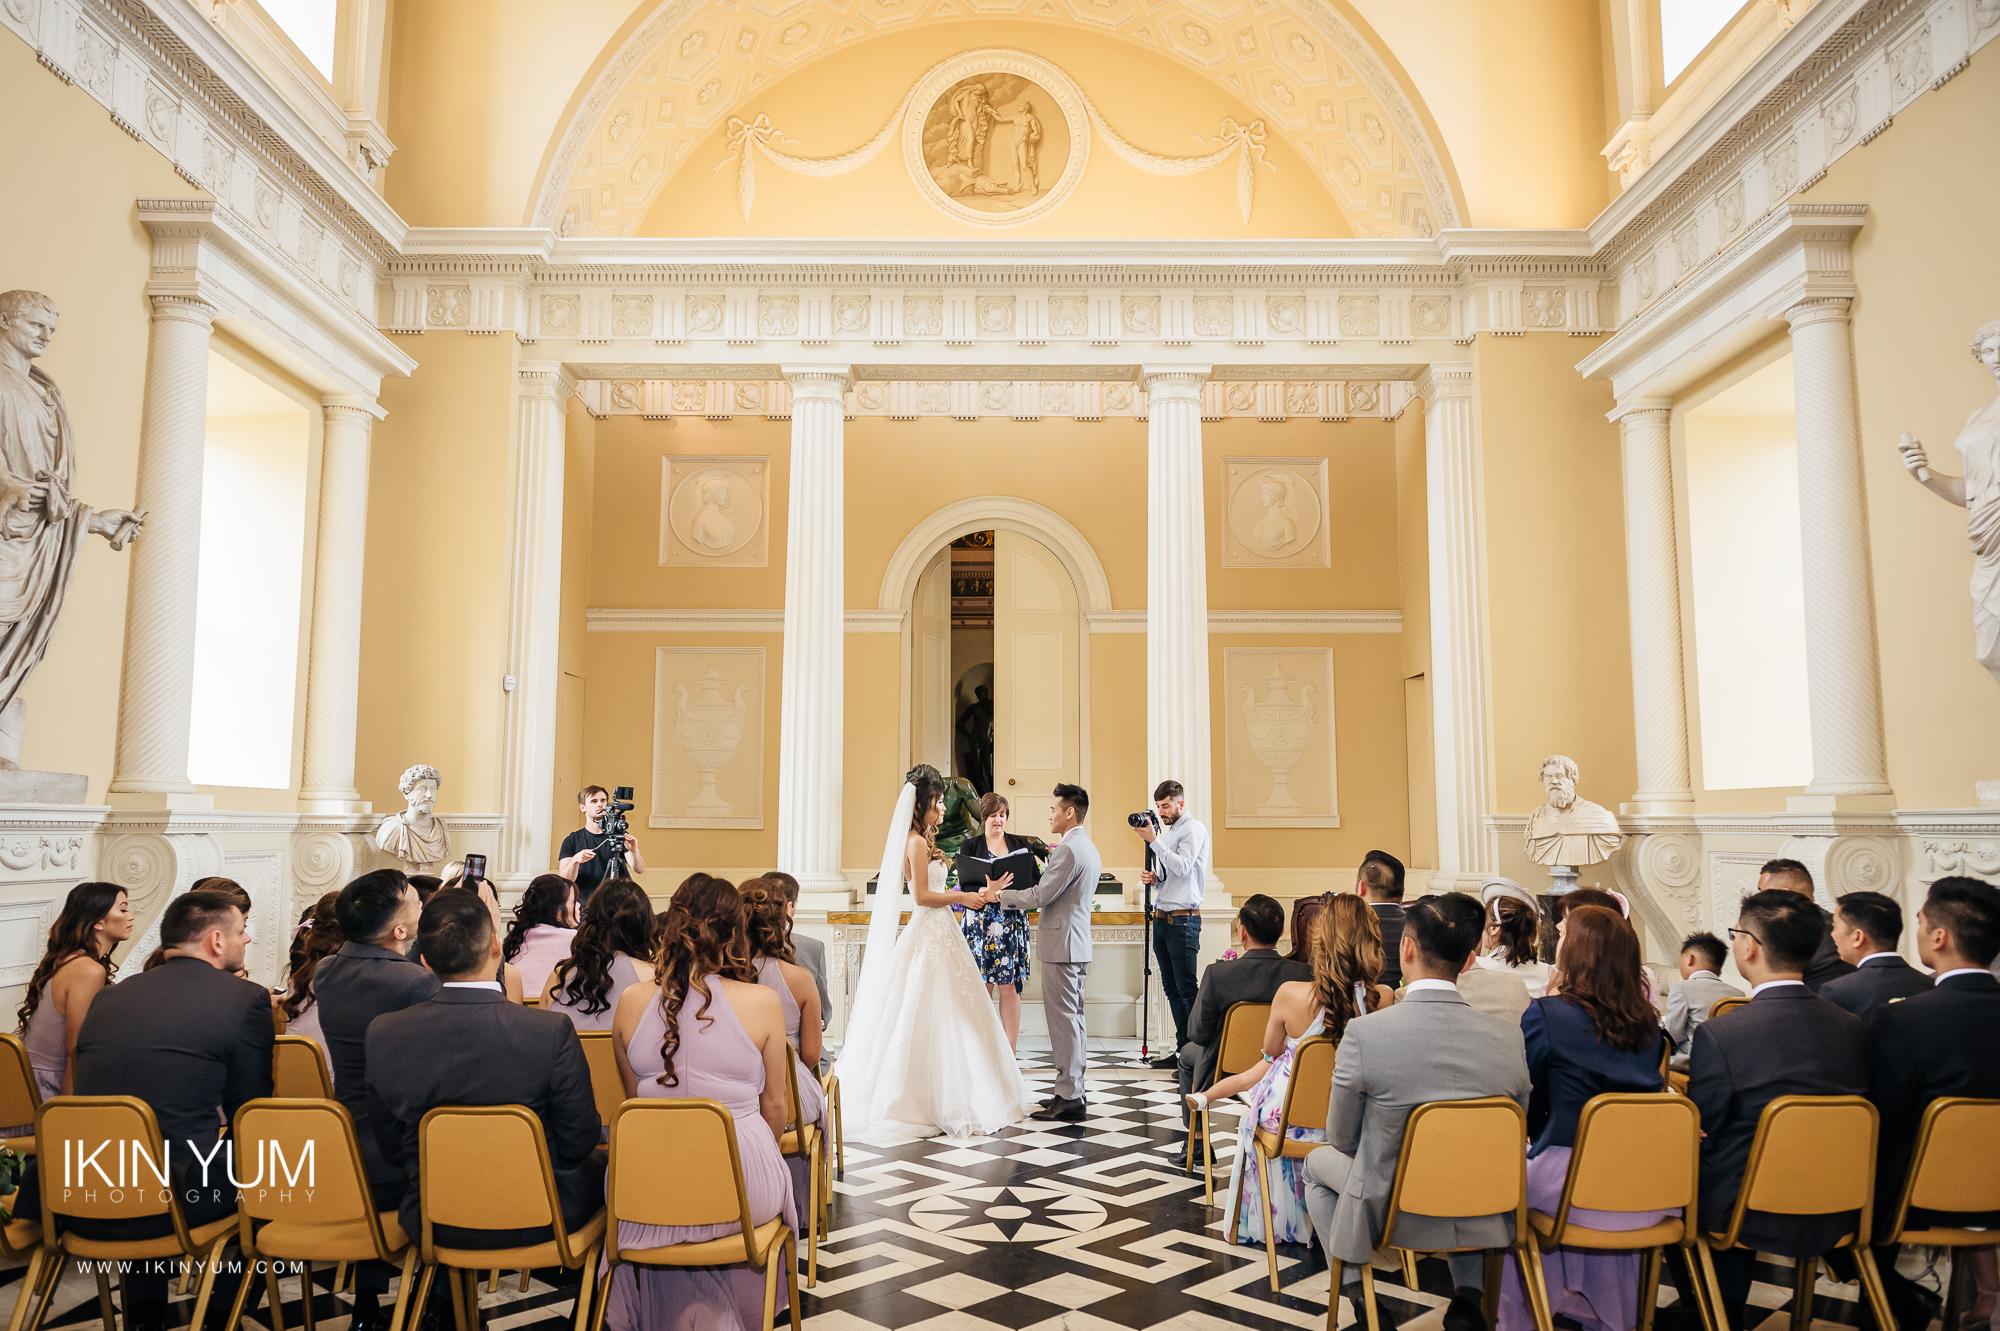 Syon Park Wedding - Ikin Yum Photography -059.jpg